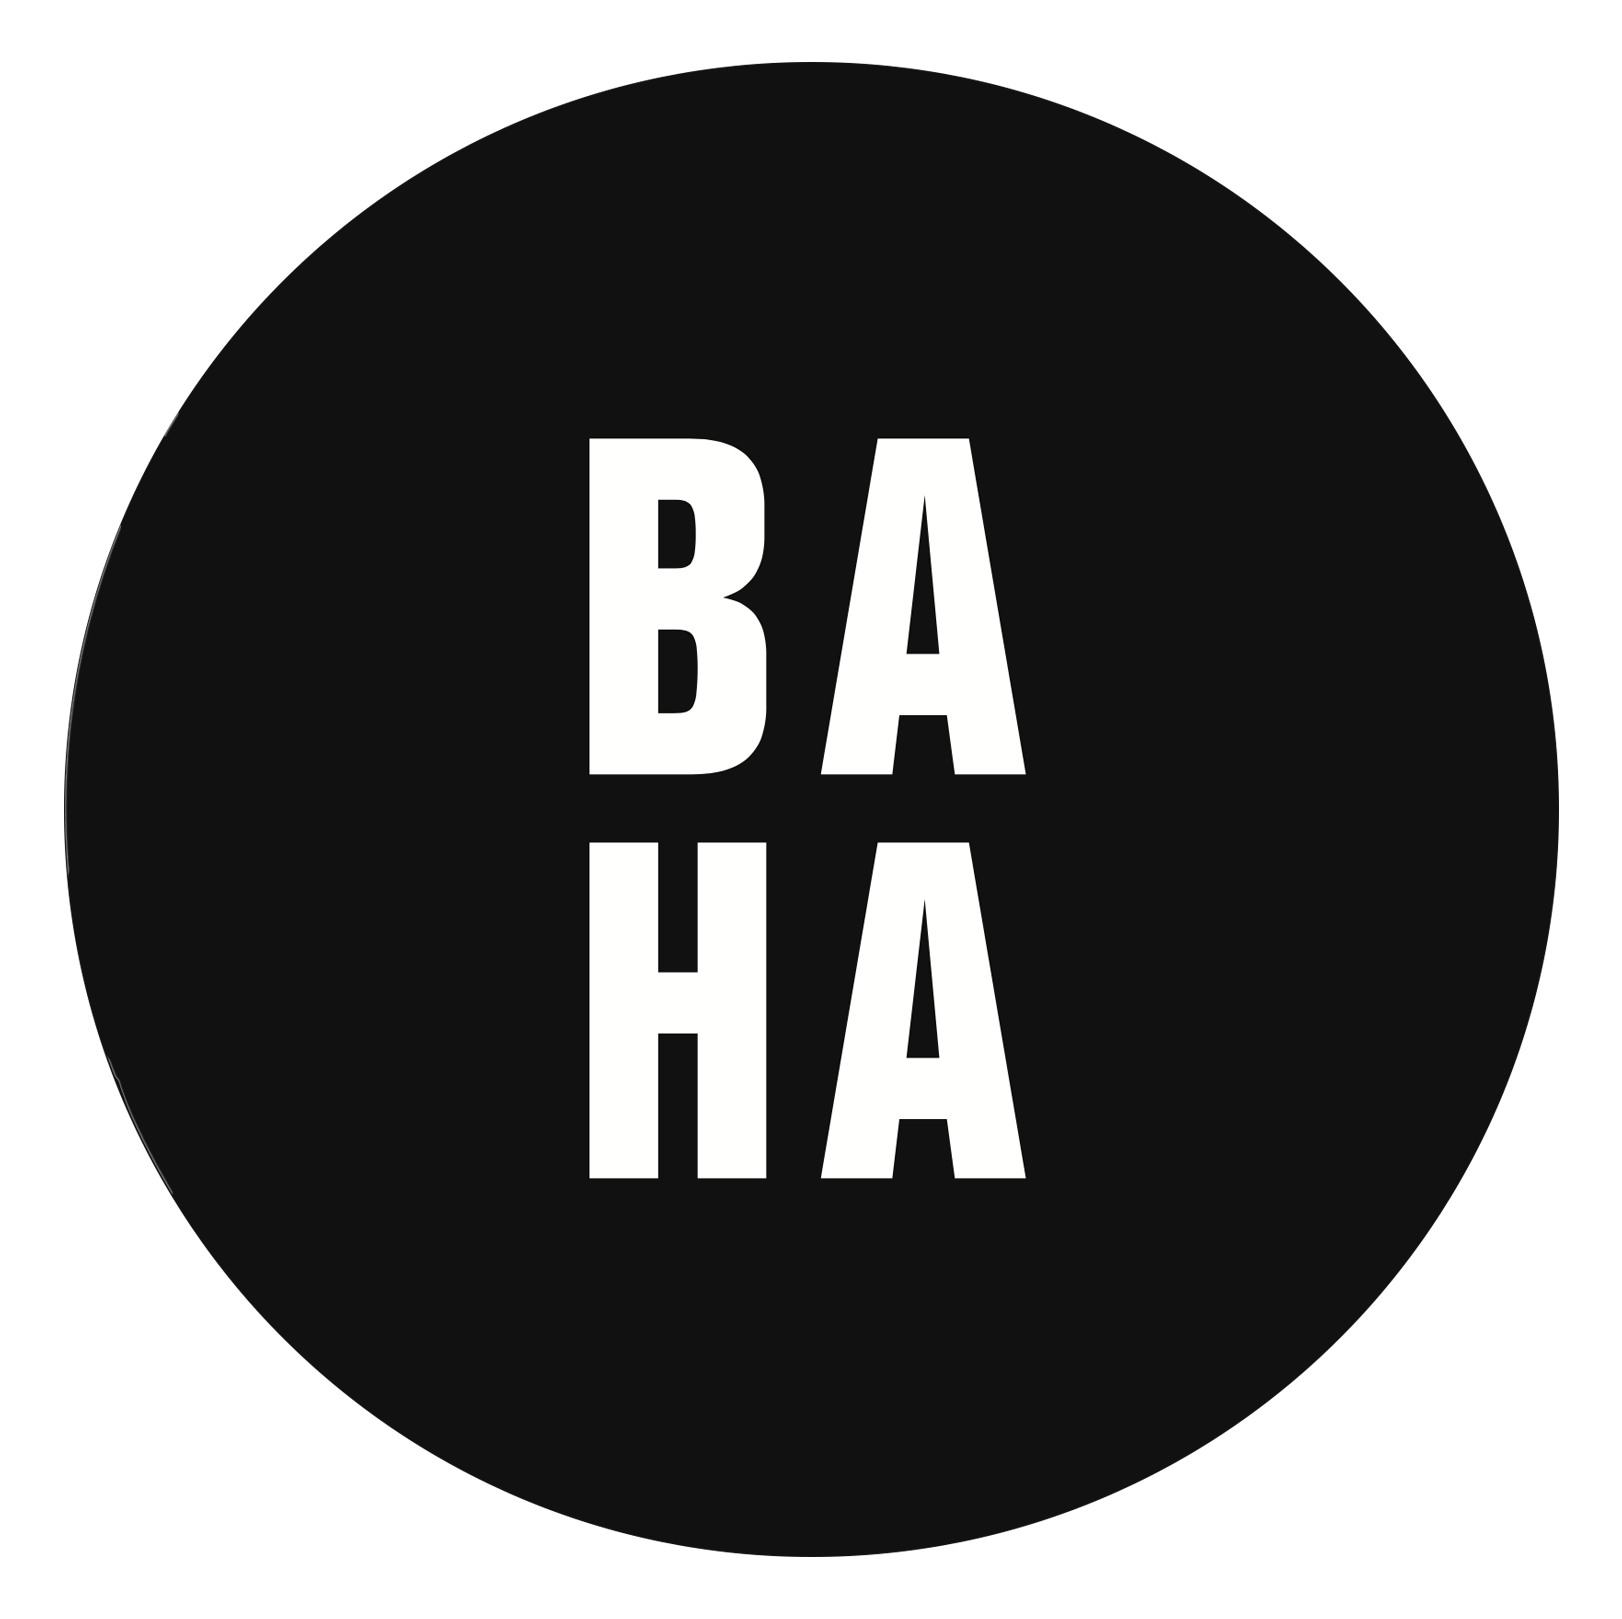 Baha Archive